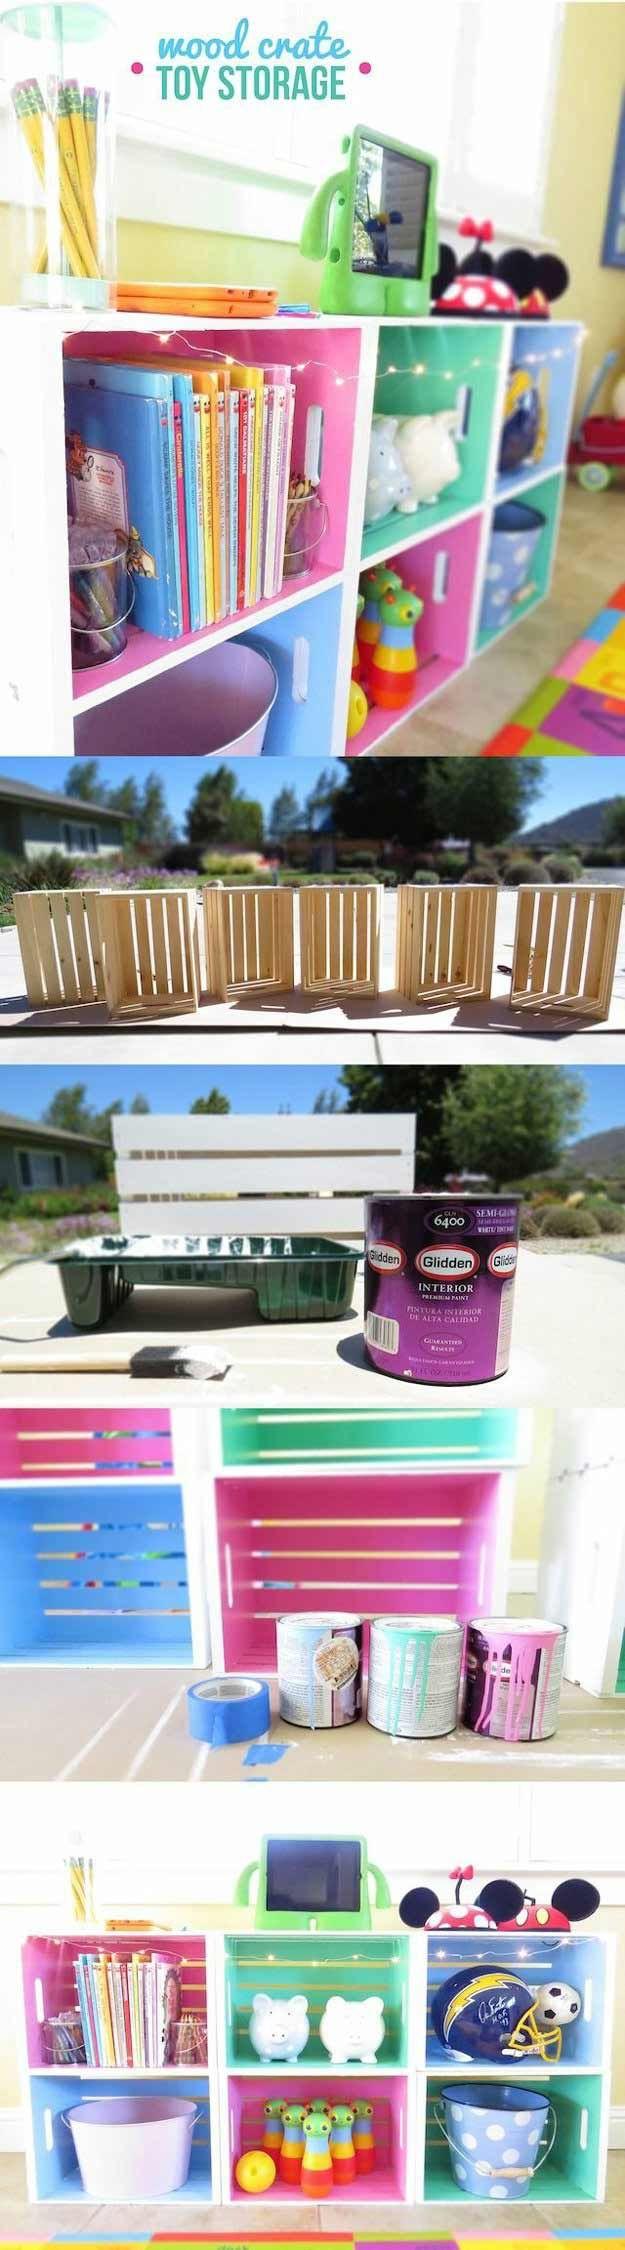 Amazing DIY Wood Crate Storage | 24 Smart DIY Toy U0026 Crafts Storage Solutions | Home  Organization Part 24